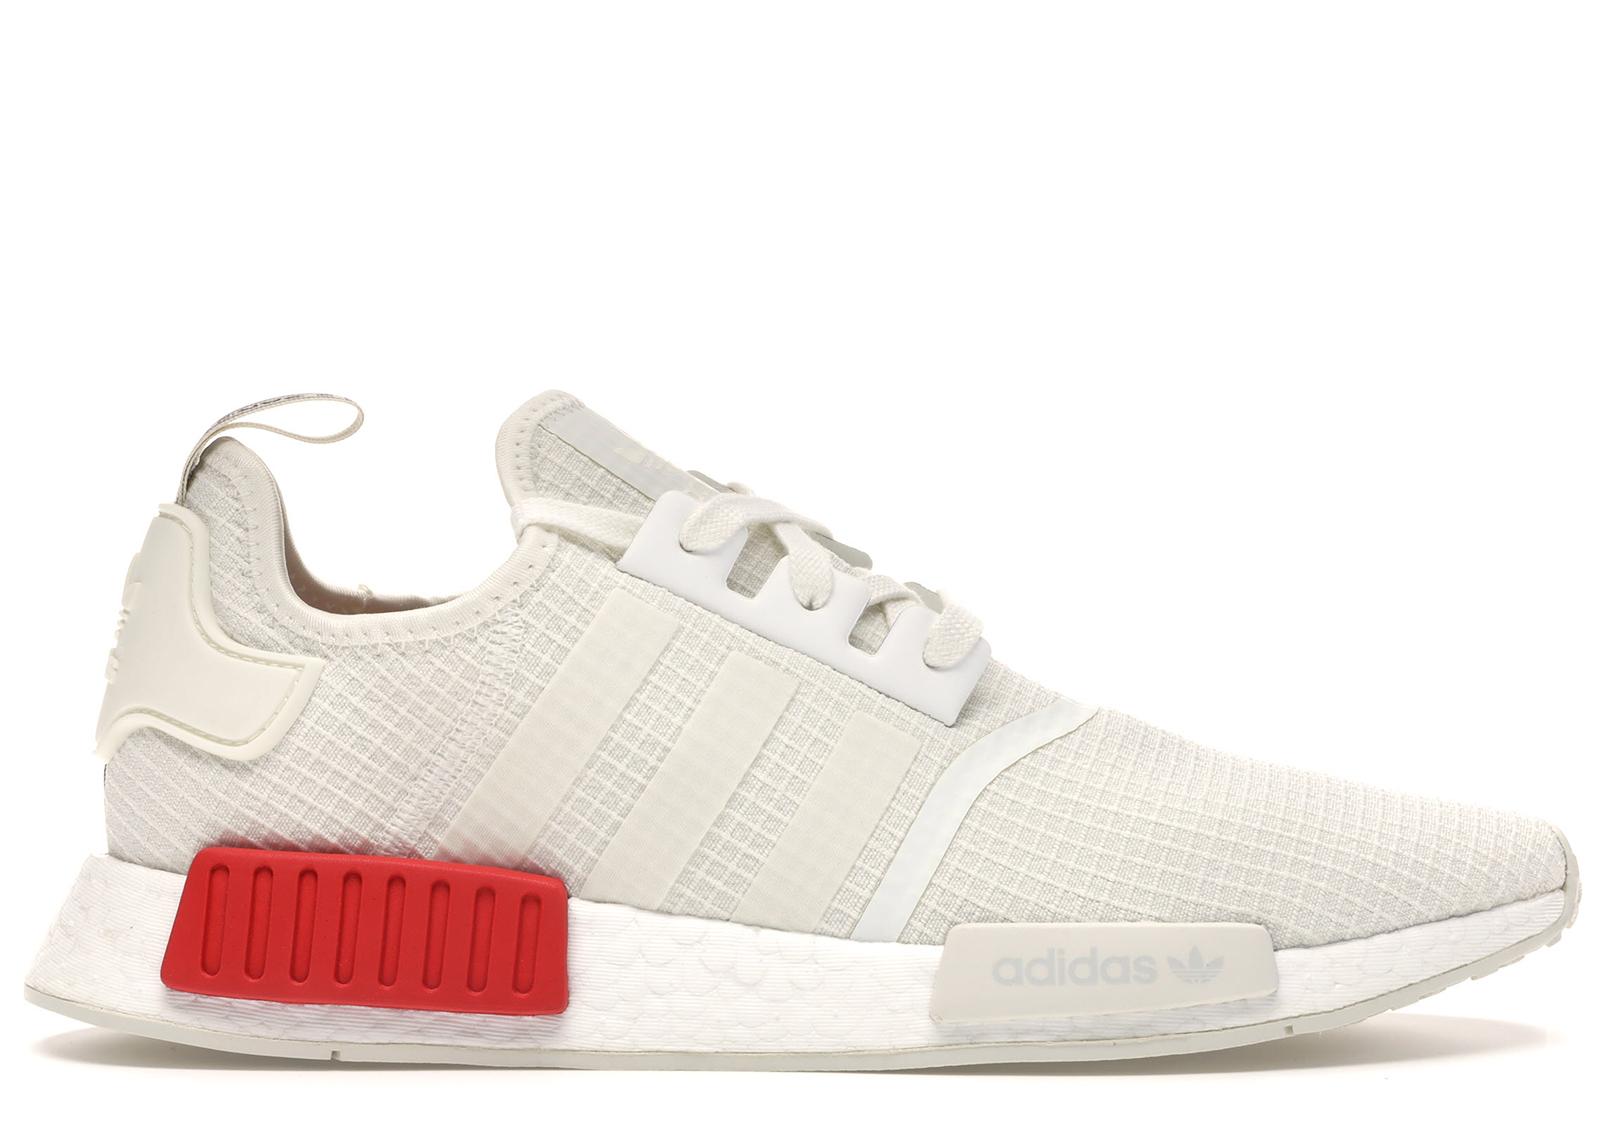 adidas NMD R1 White Red | B37619